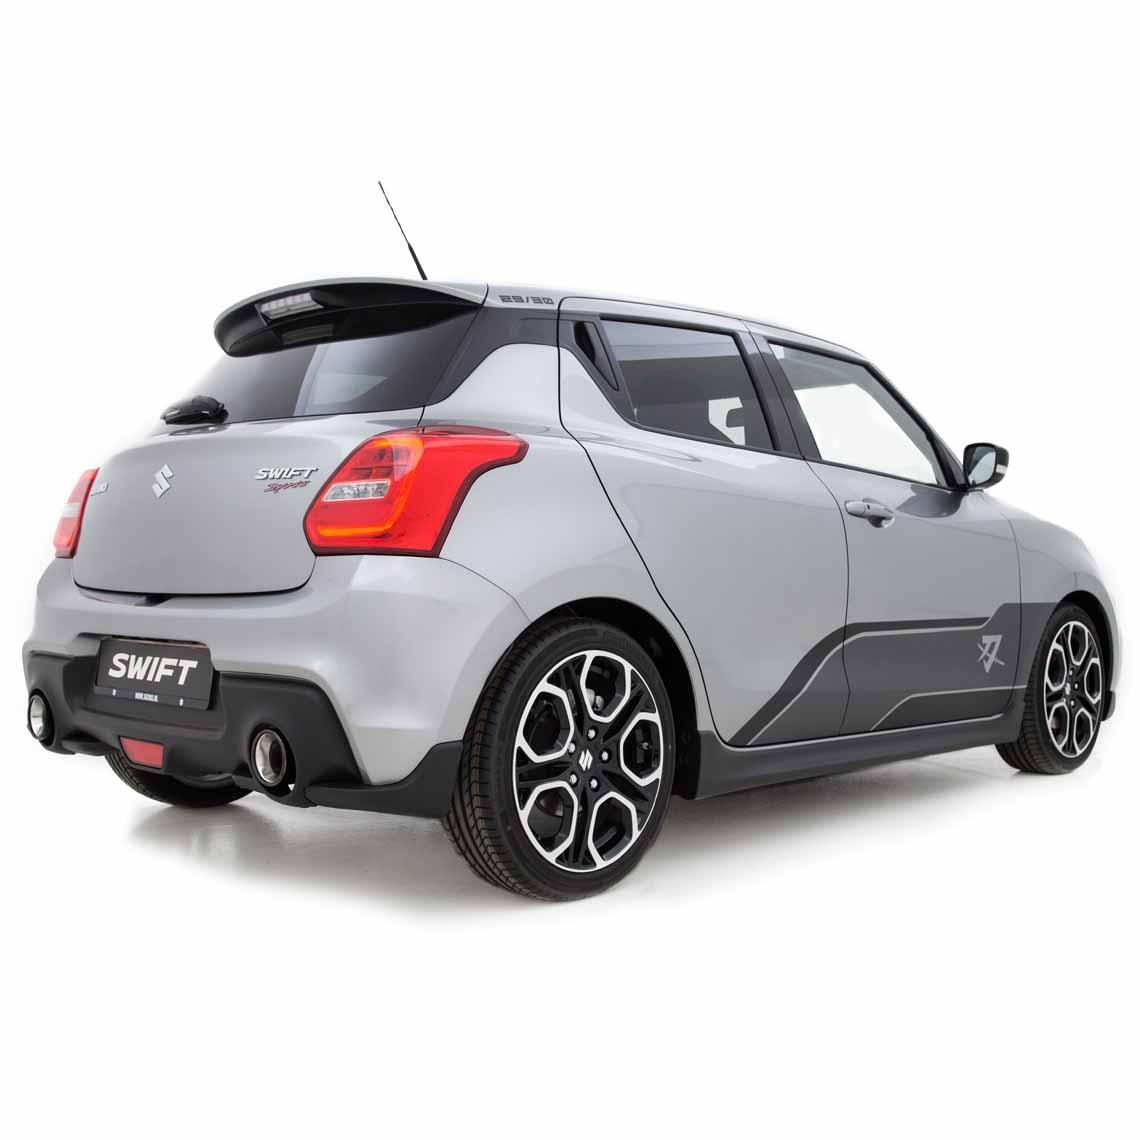 The Suzuki Swift Sport Katana Is a Tiny Hell-Raiser We Want